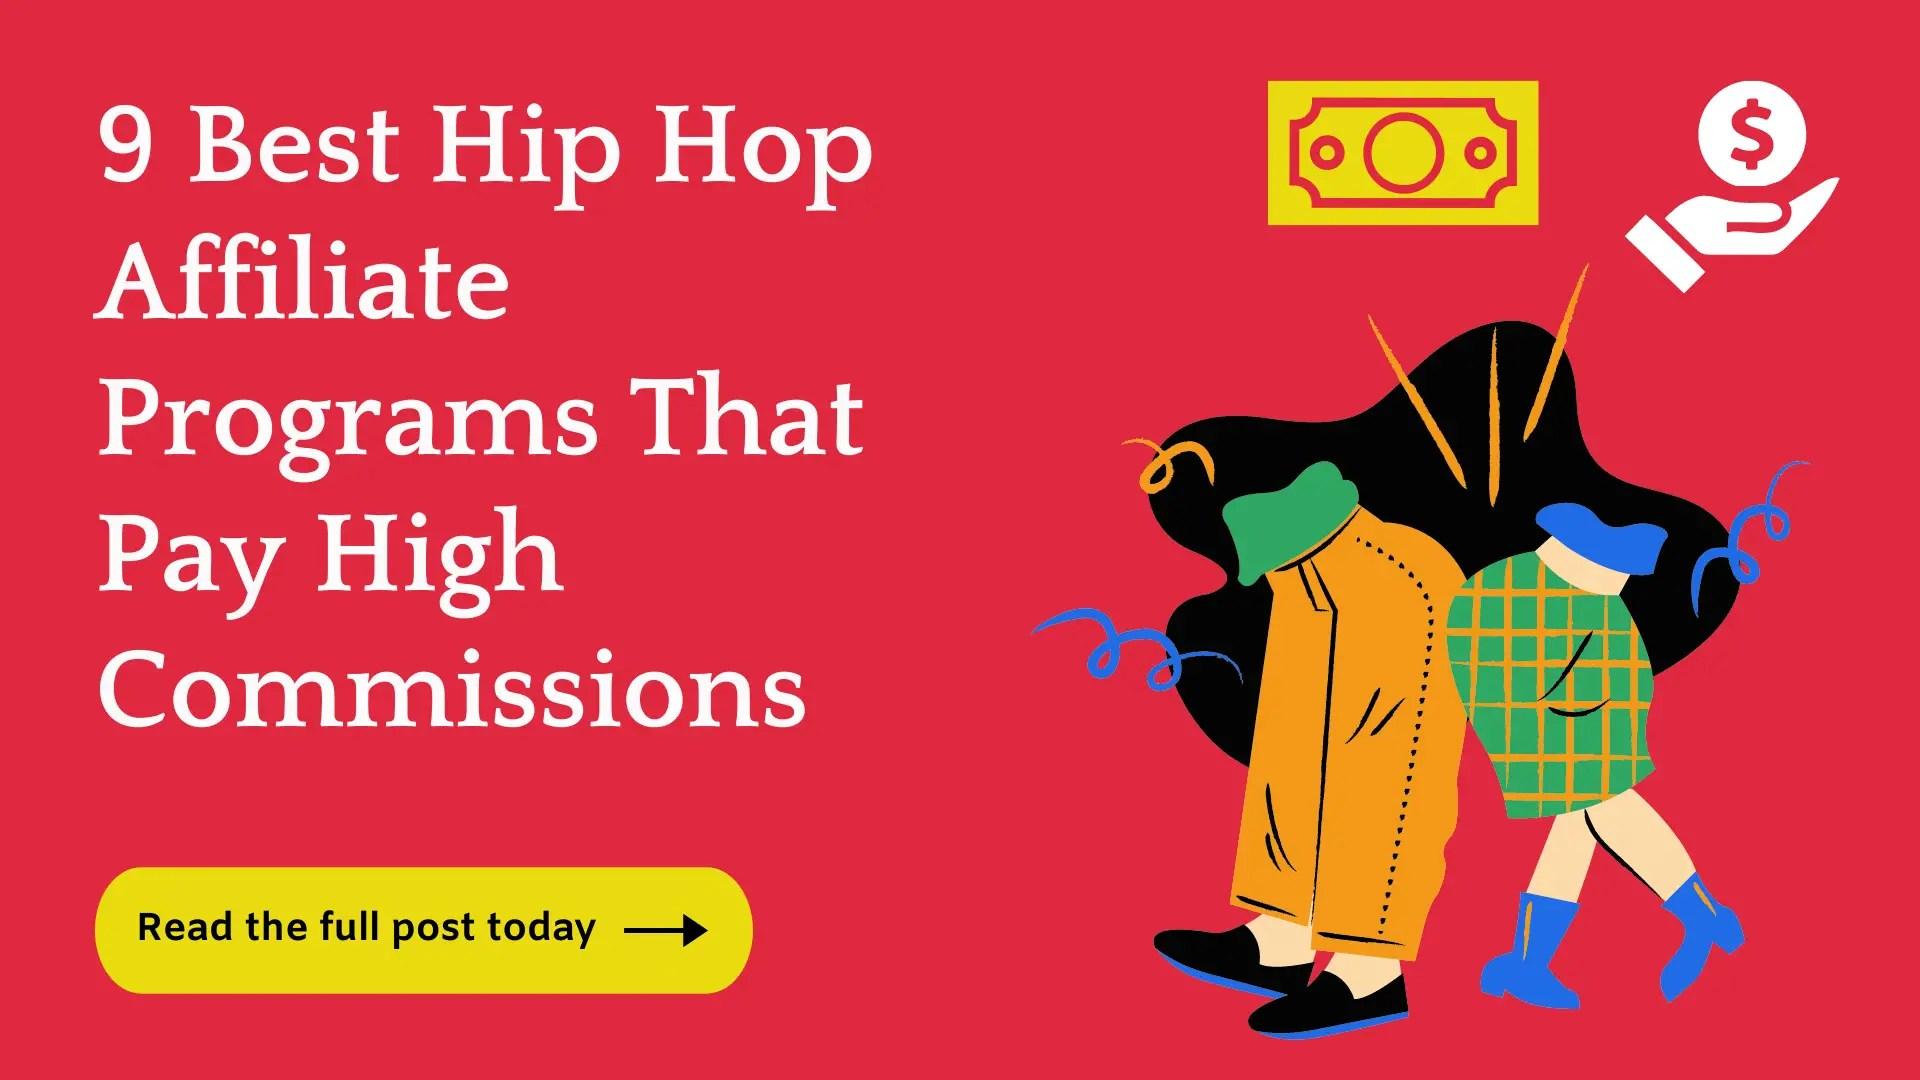 Top Hip Hop Affiliate Programs